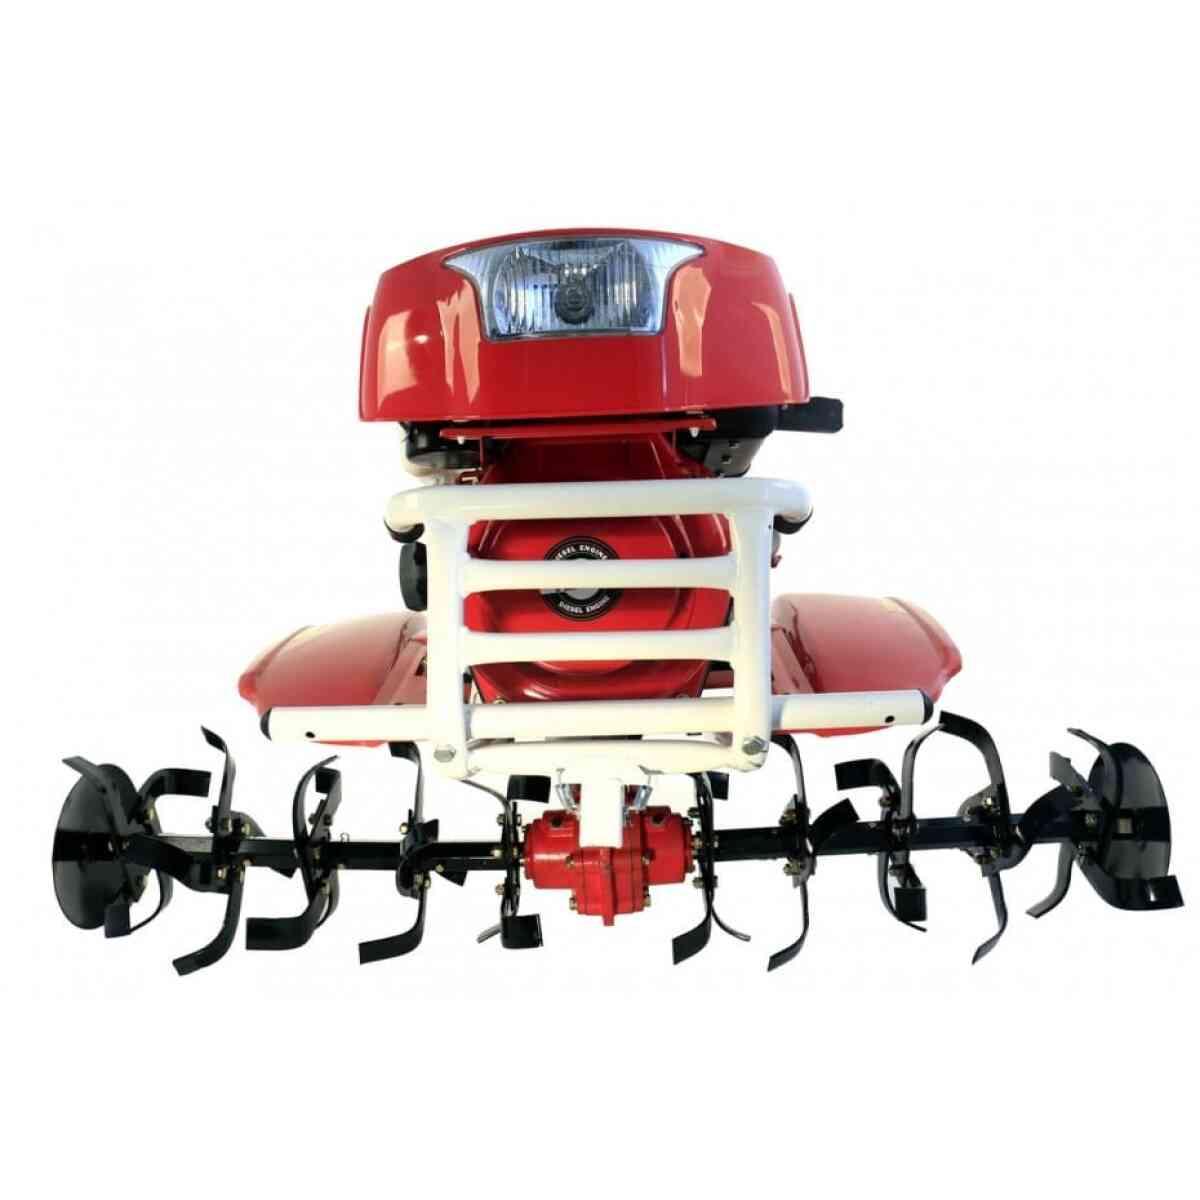 motocultor pro series new 1350 s o mac.ro 8 1 12